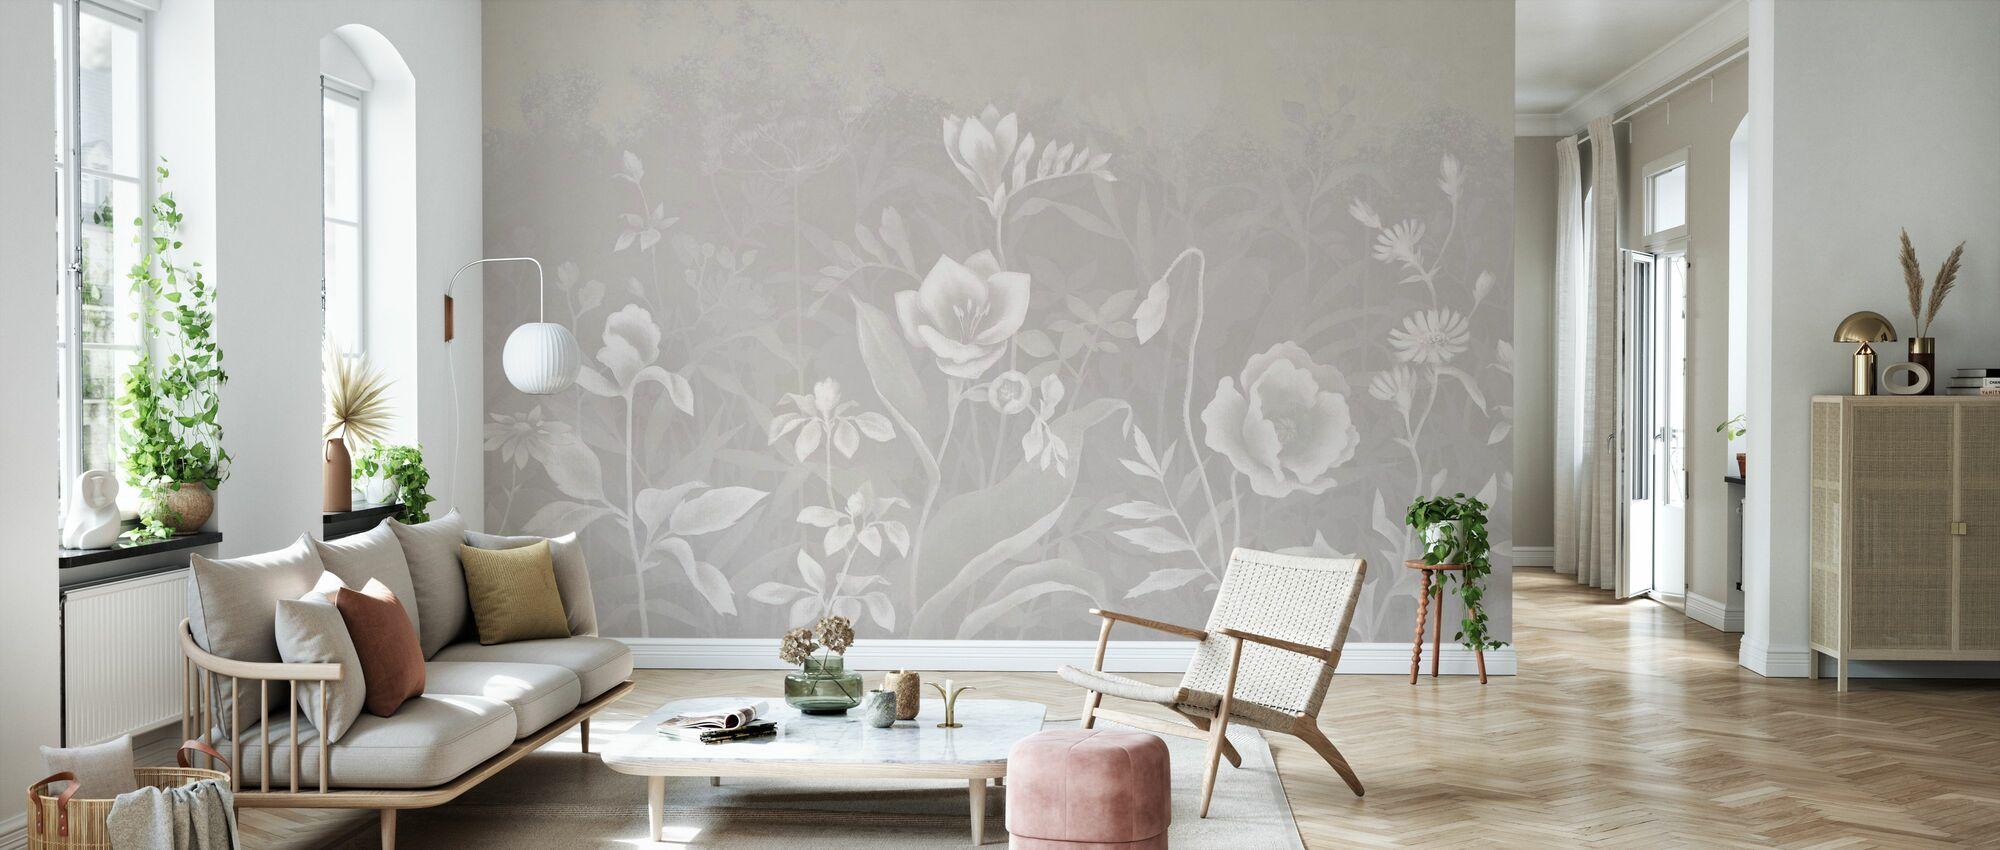 Gentle Botanical - Begie - Wallpaper - Living Room